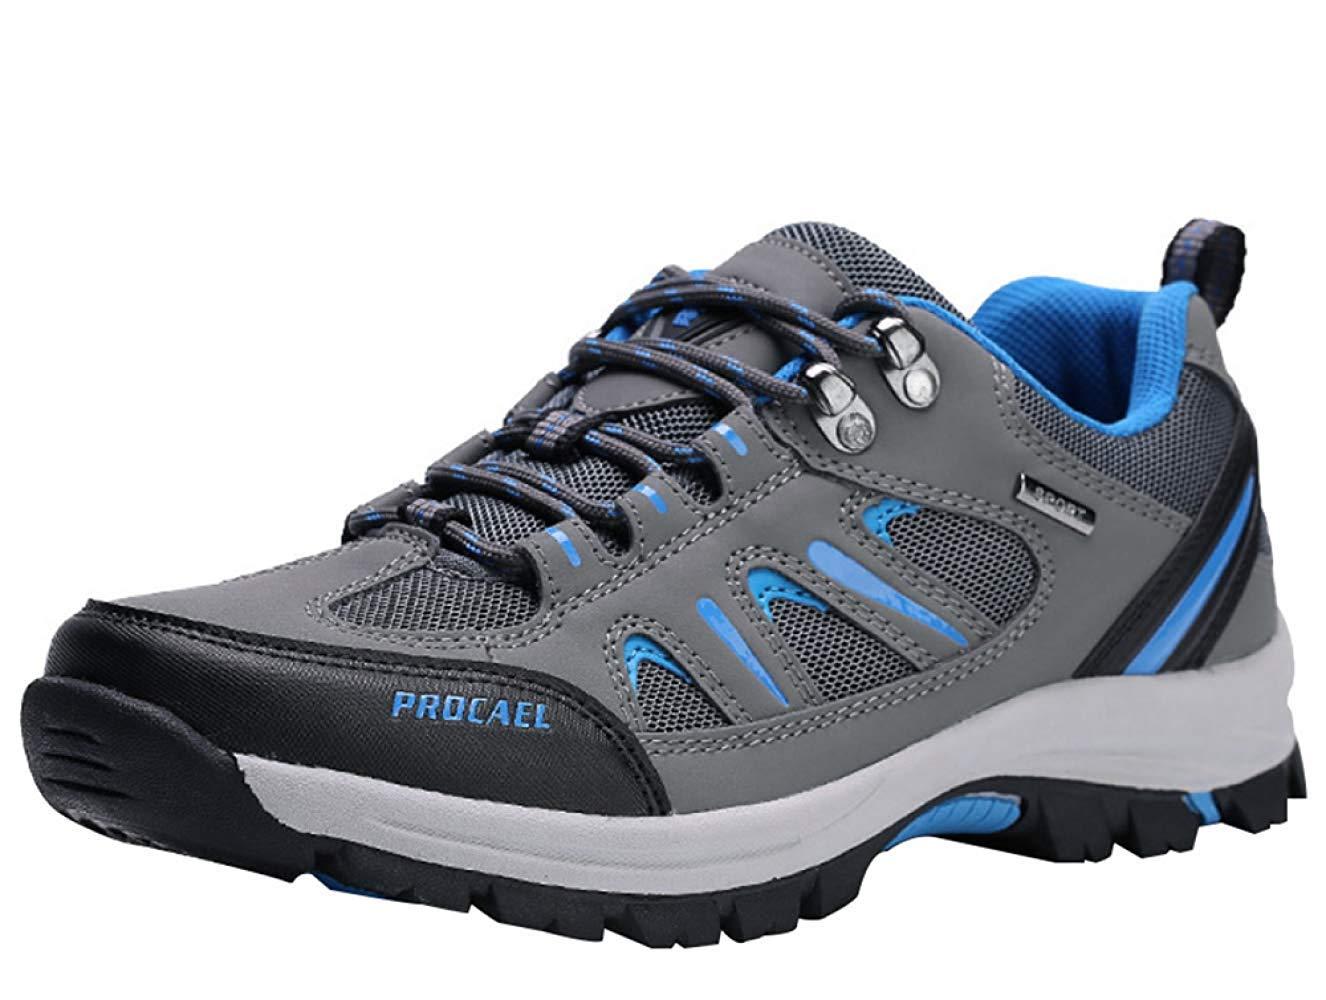 HhGold Männer Wanderschuhe Stiefel Leder Wanderschuhe Turnschuhe Für Outdoor Trekking Training Beiläufige Arbeit (Farbe : 2, Größe : 43EU)